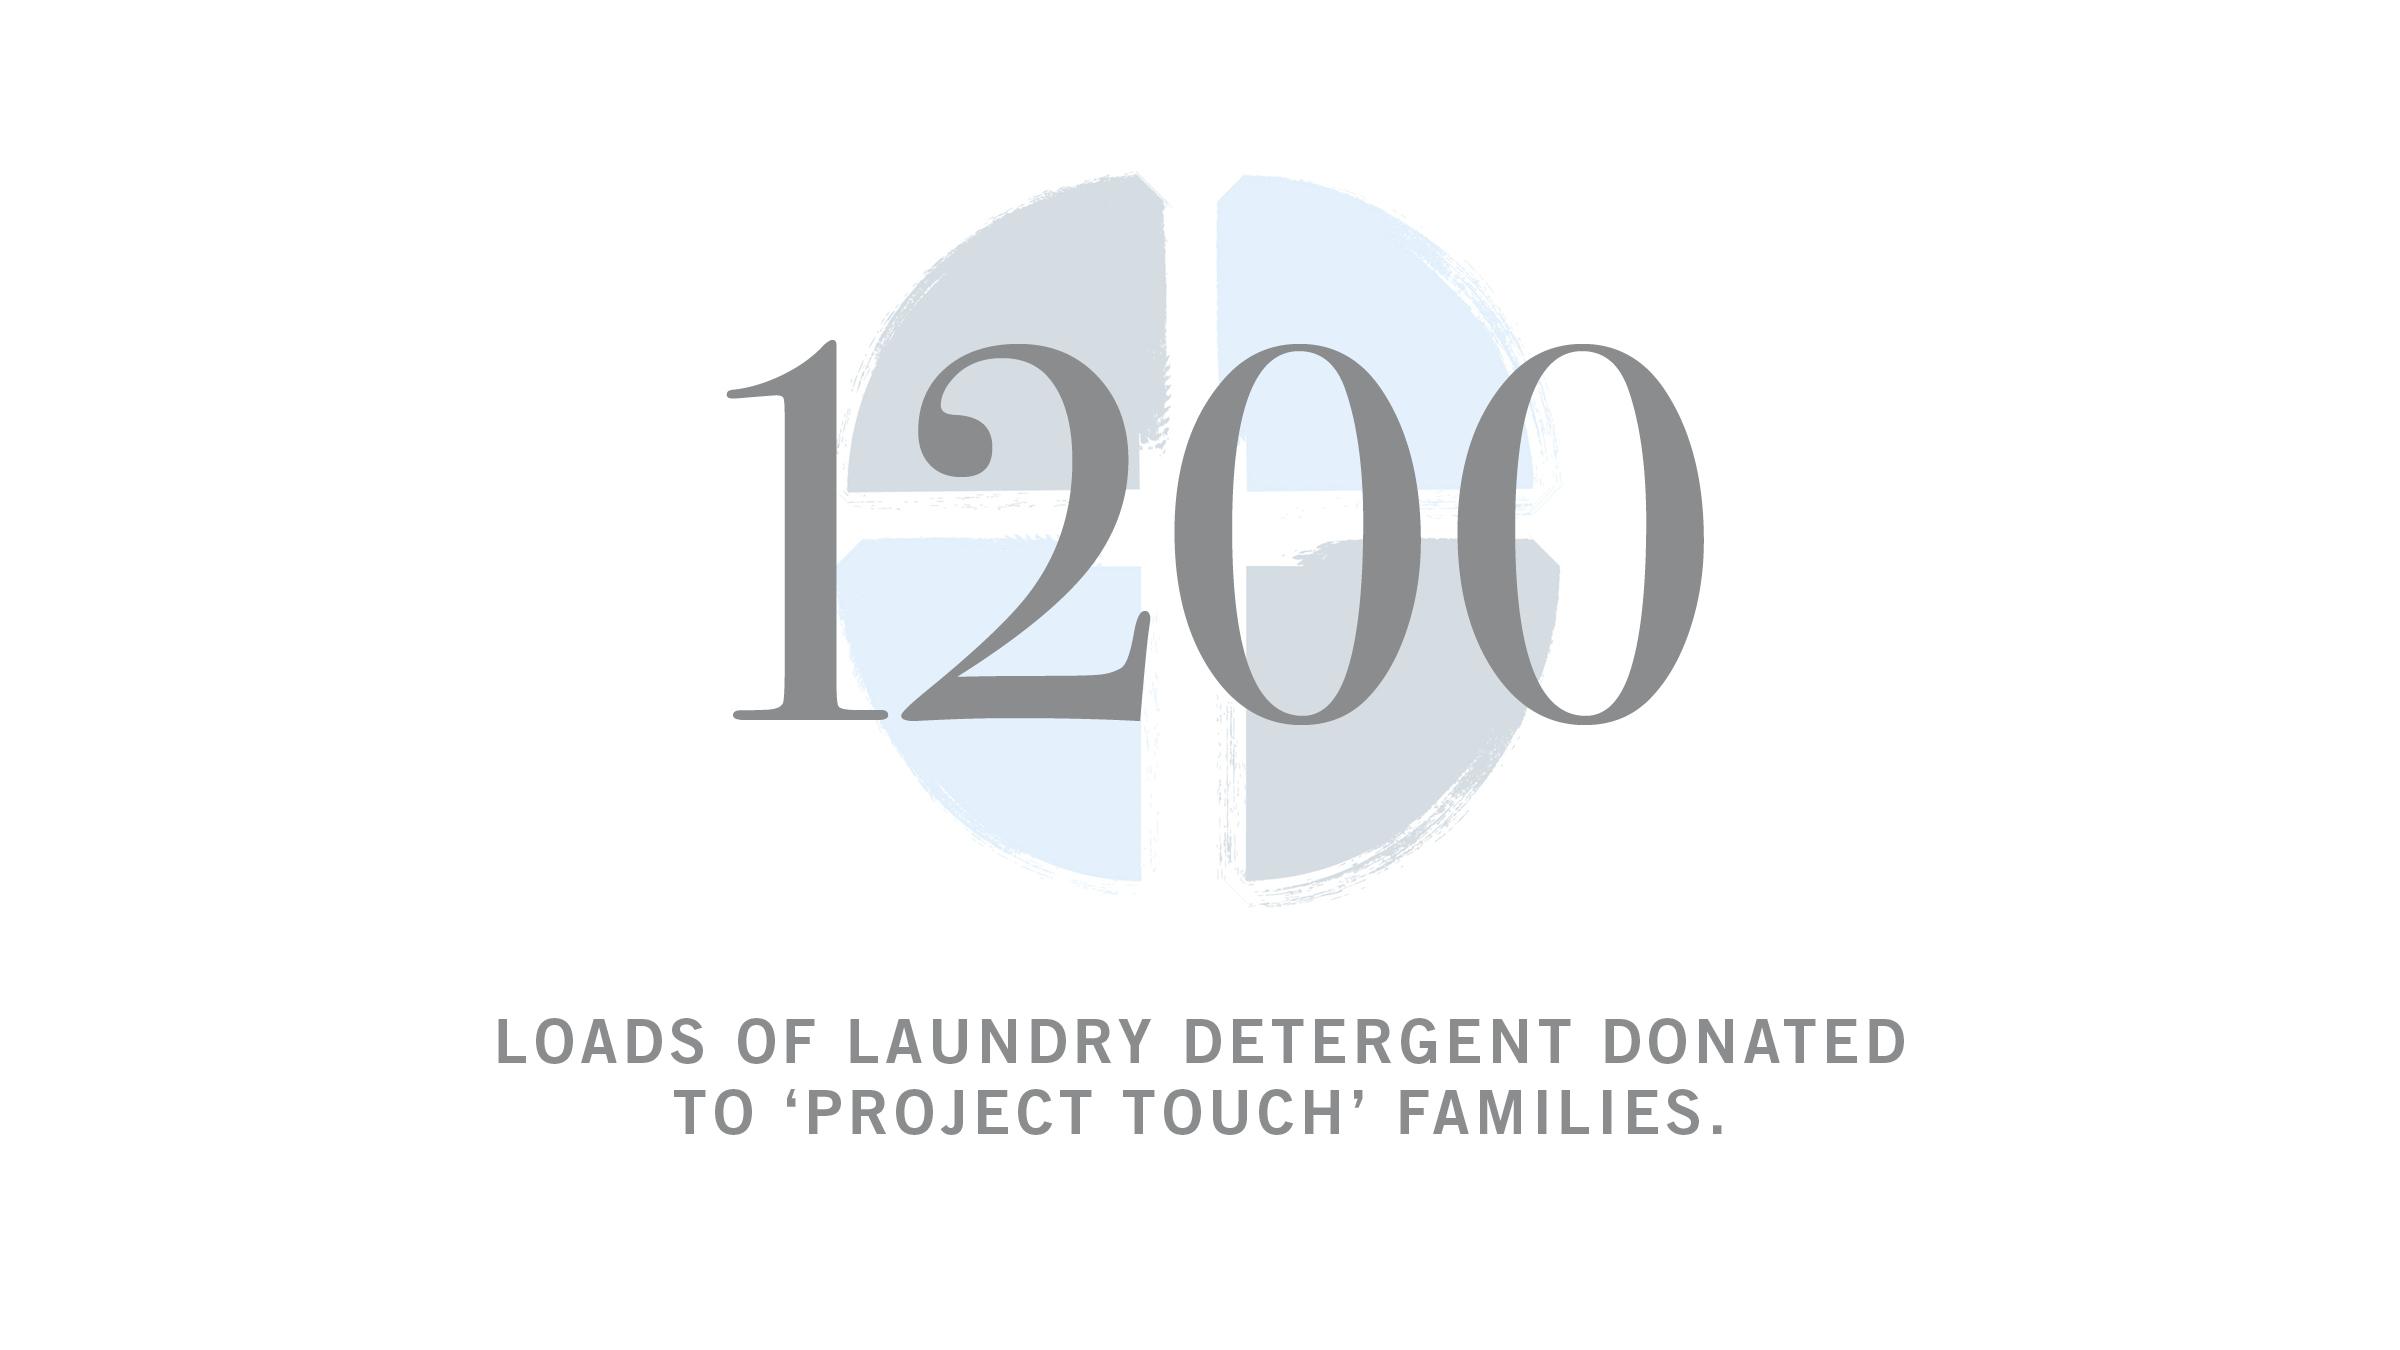 1200 Laundry.jpg